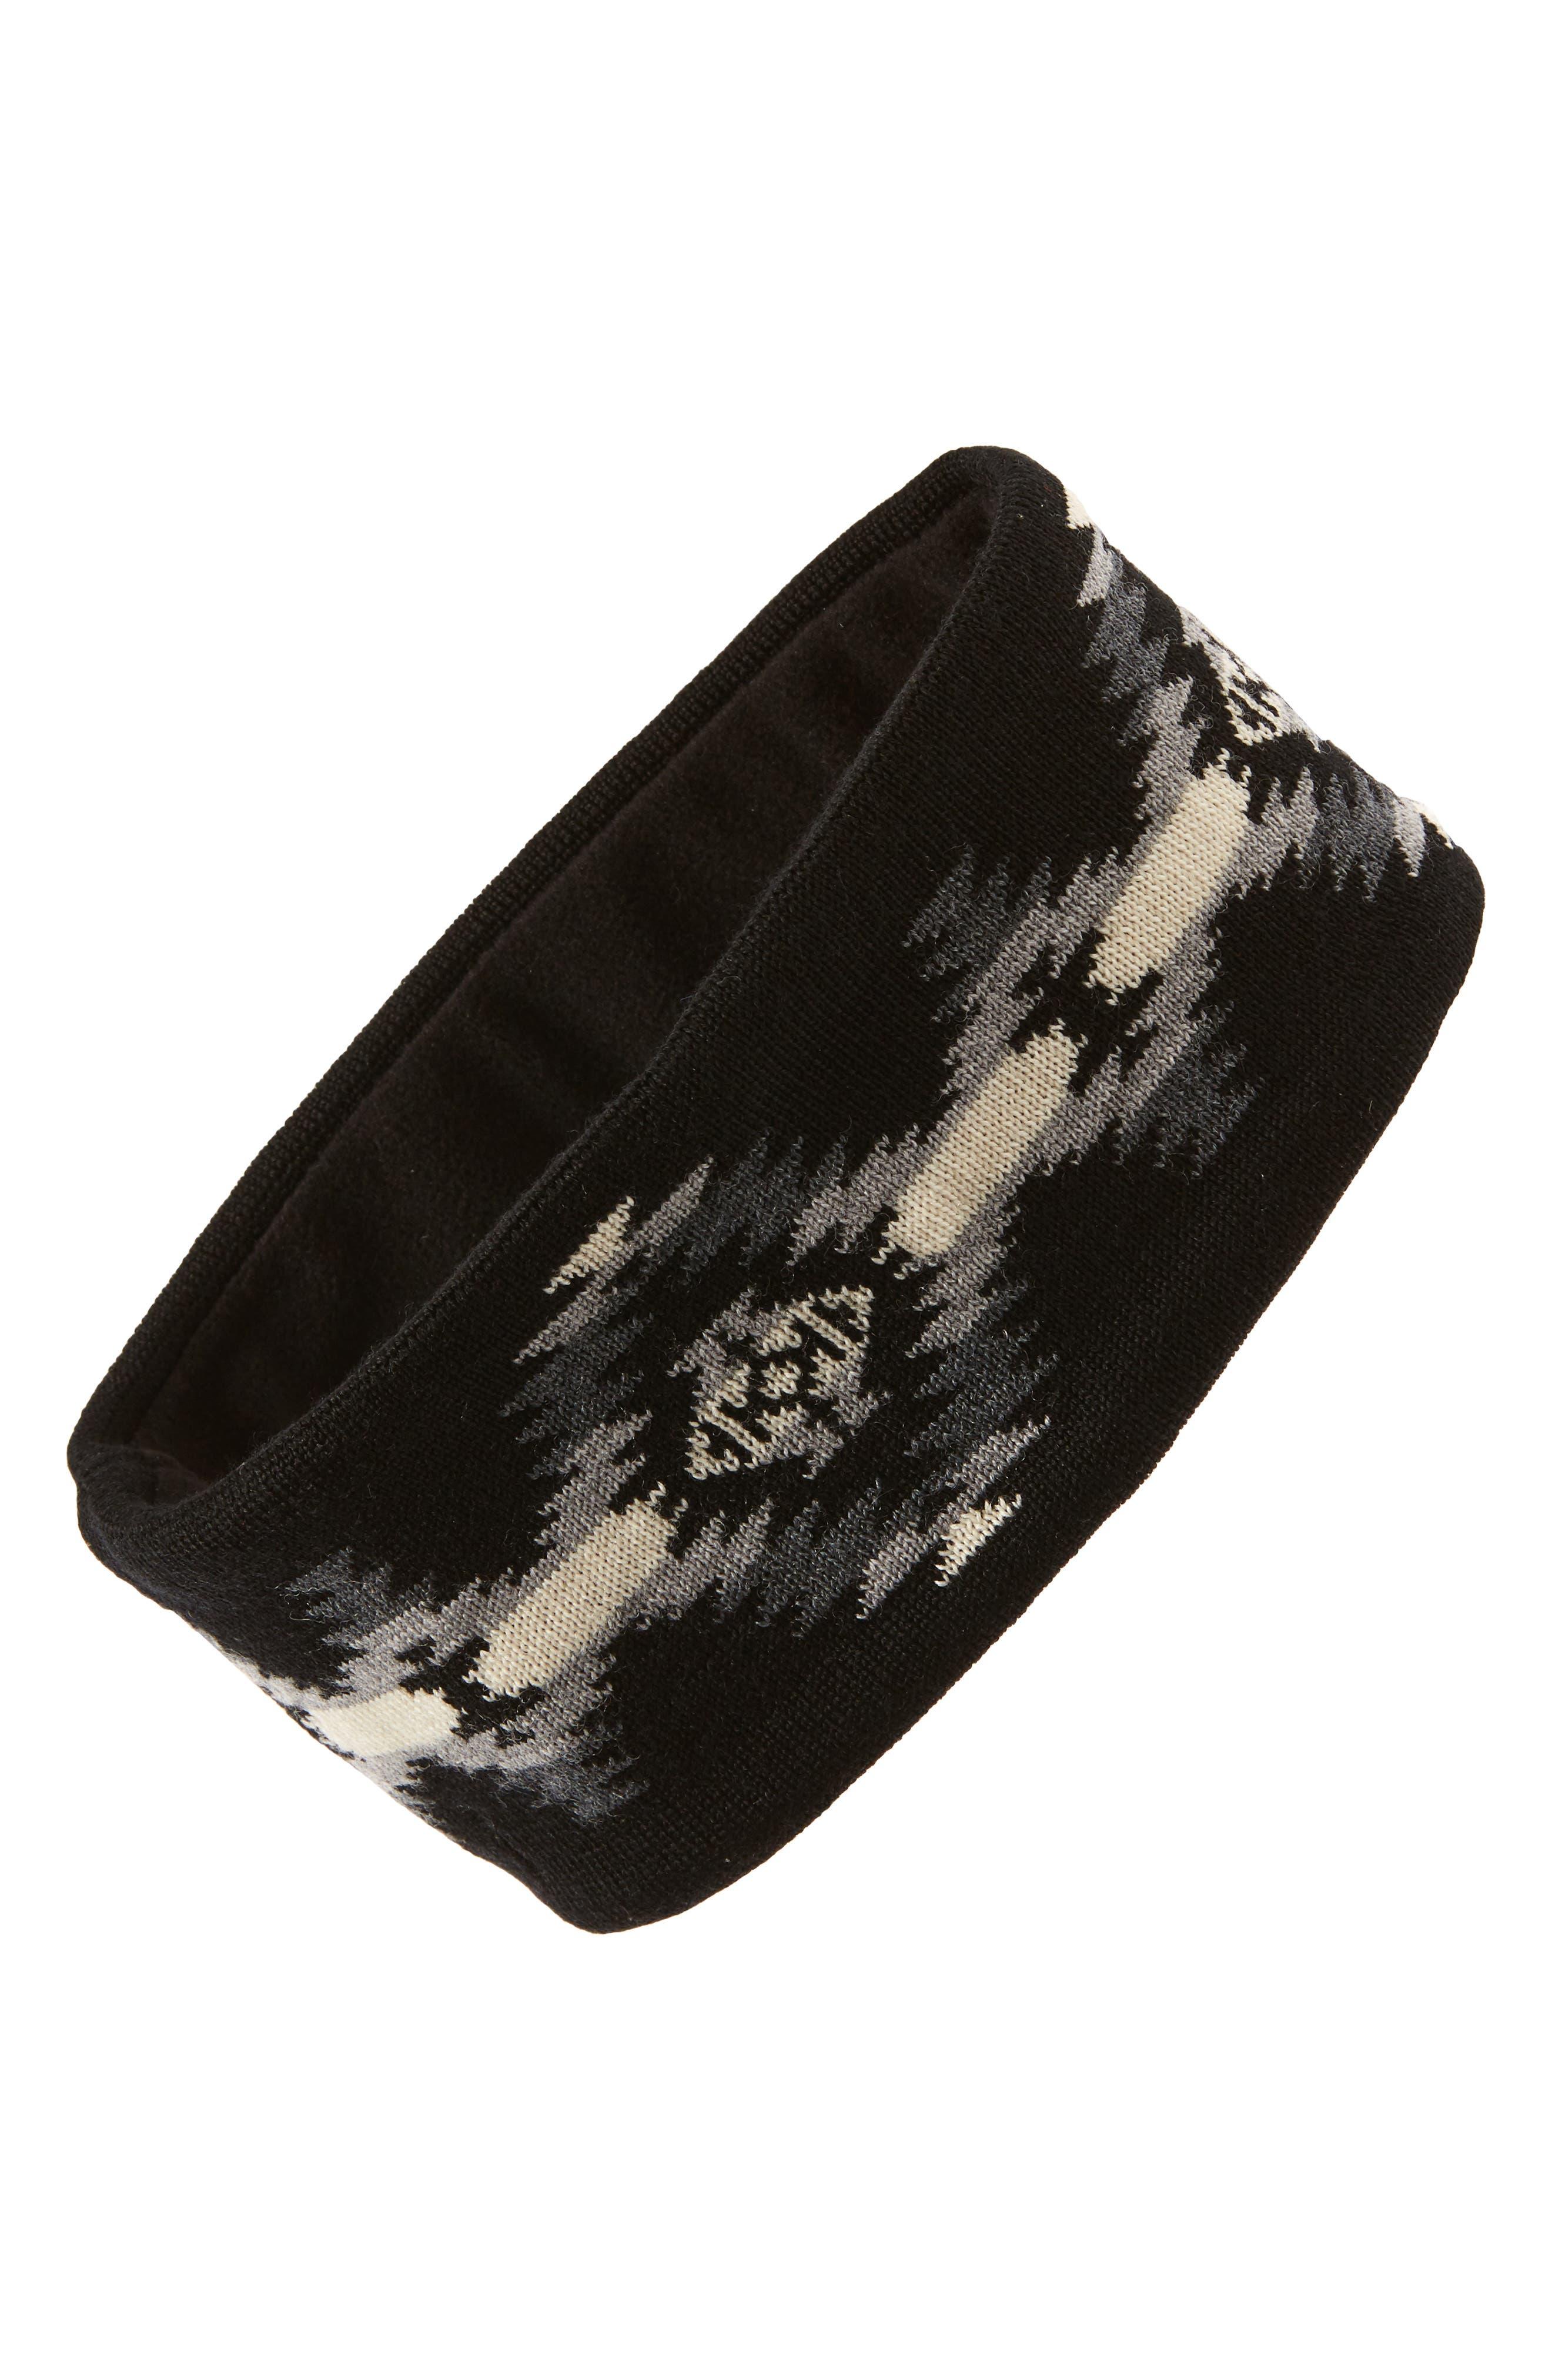 Main Image - Pendleton Fleece Lined Headband